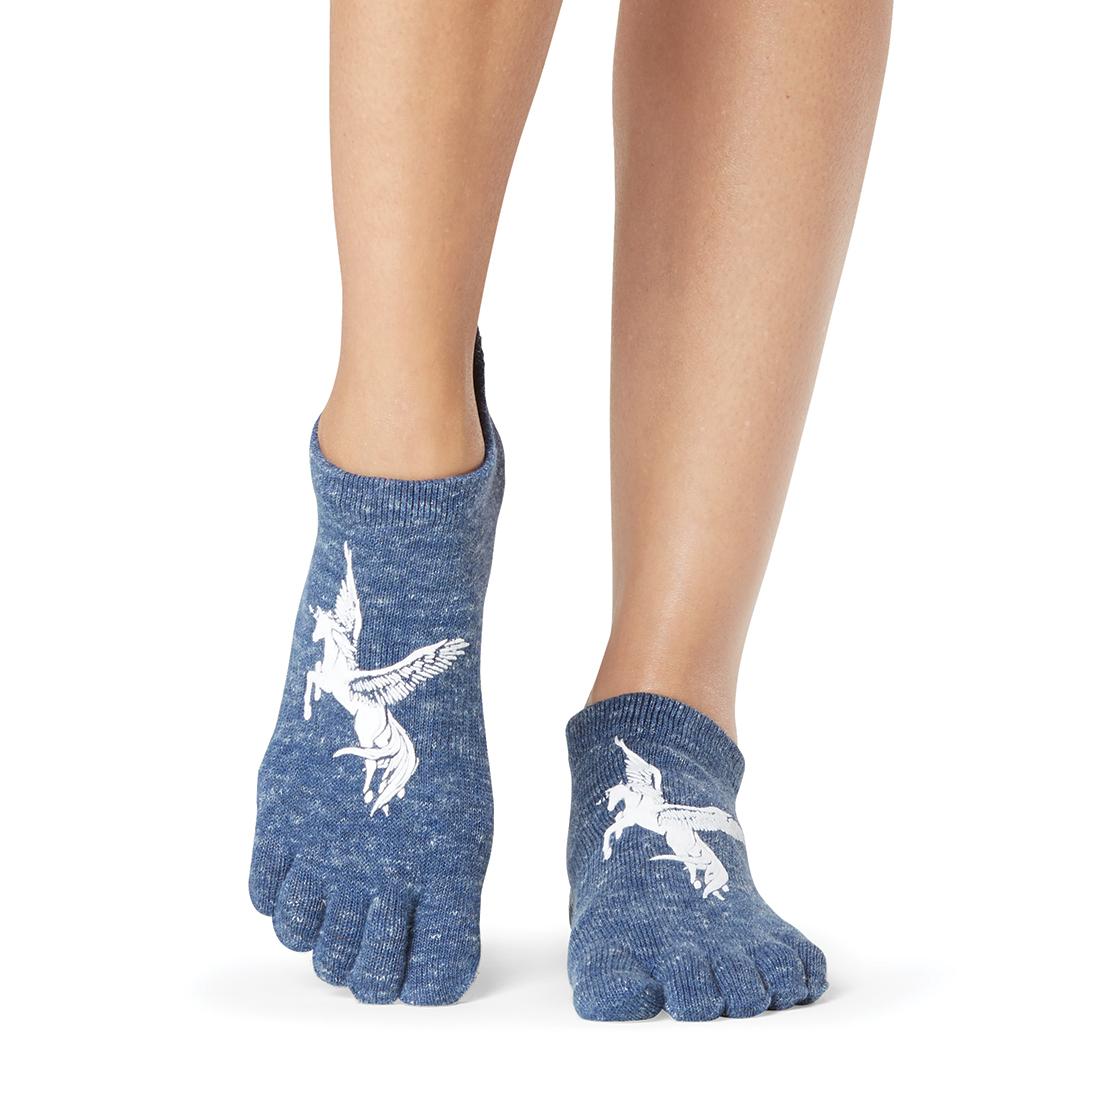 Yogasocken ToeSox Low Rise Full Toe Pegasus - 1